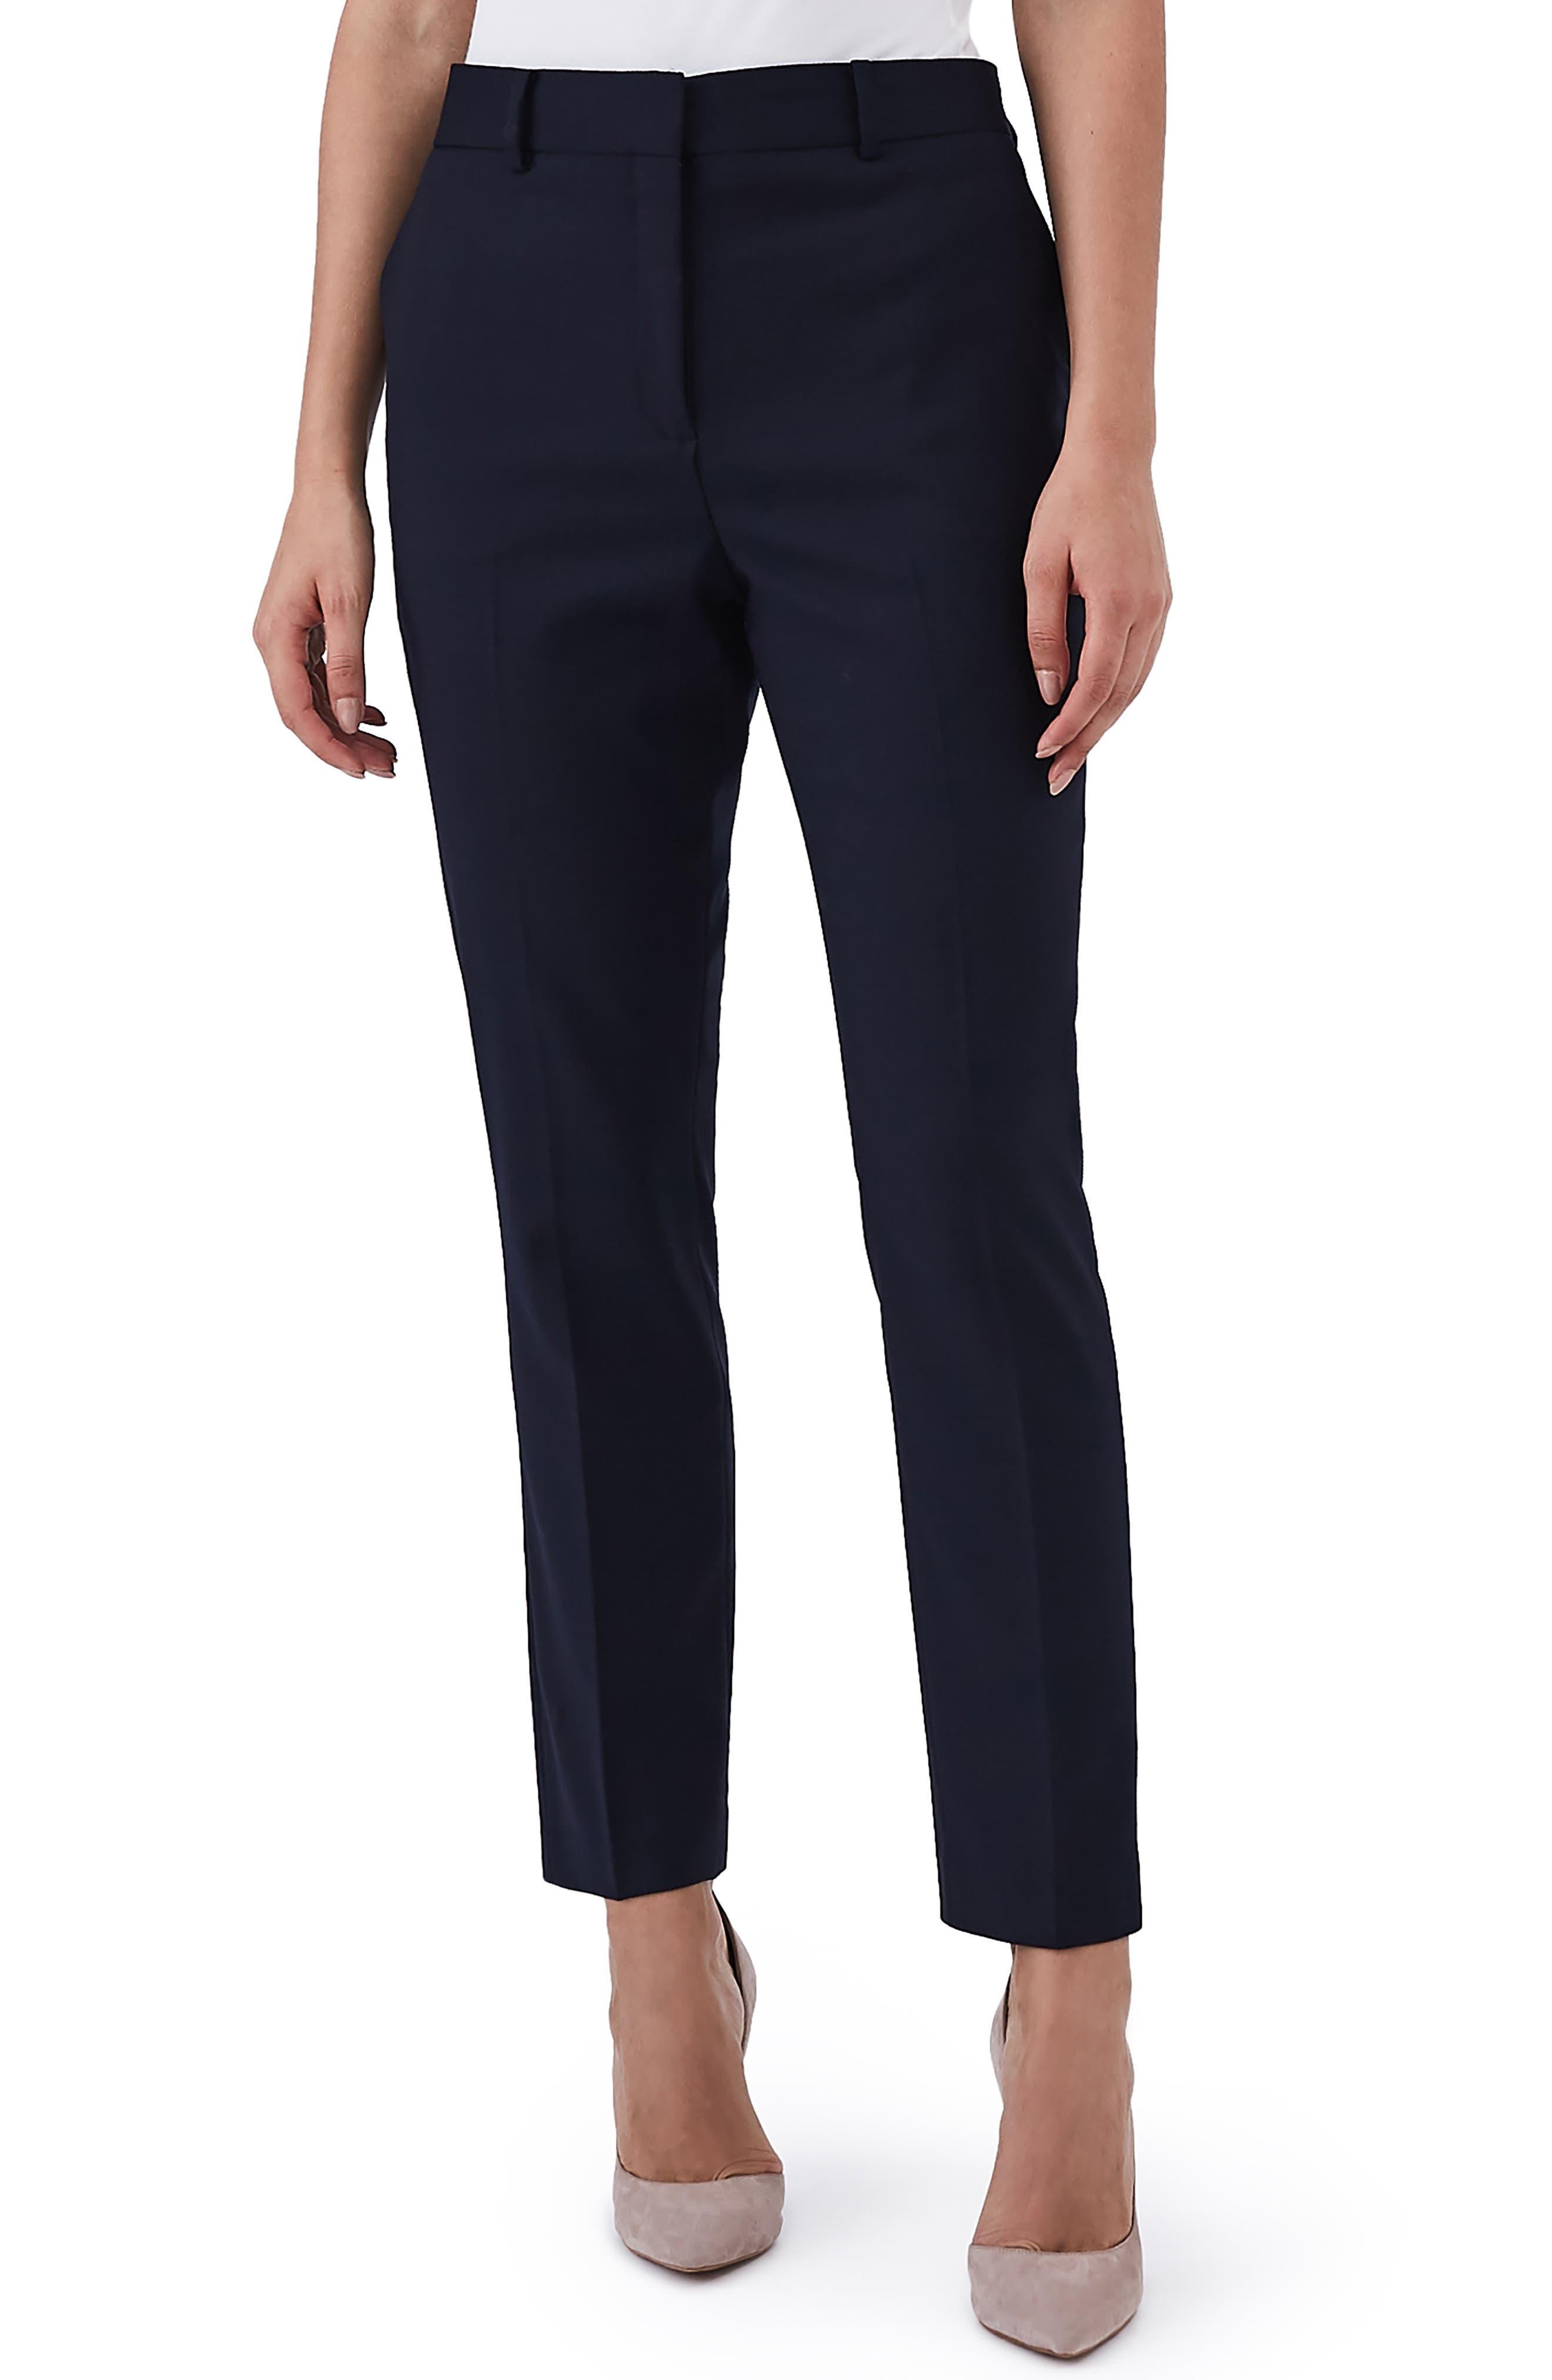 Fenton Stretch Wool Blend Slim Pants,                             Main thumbnail 1, color,                             NAVY